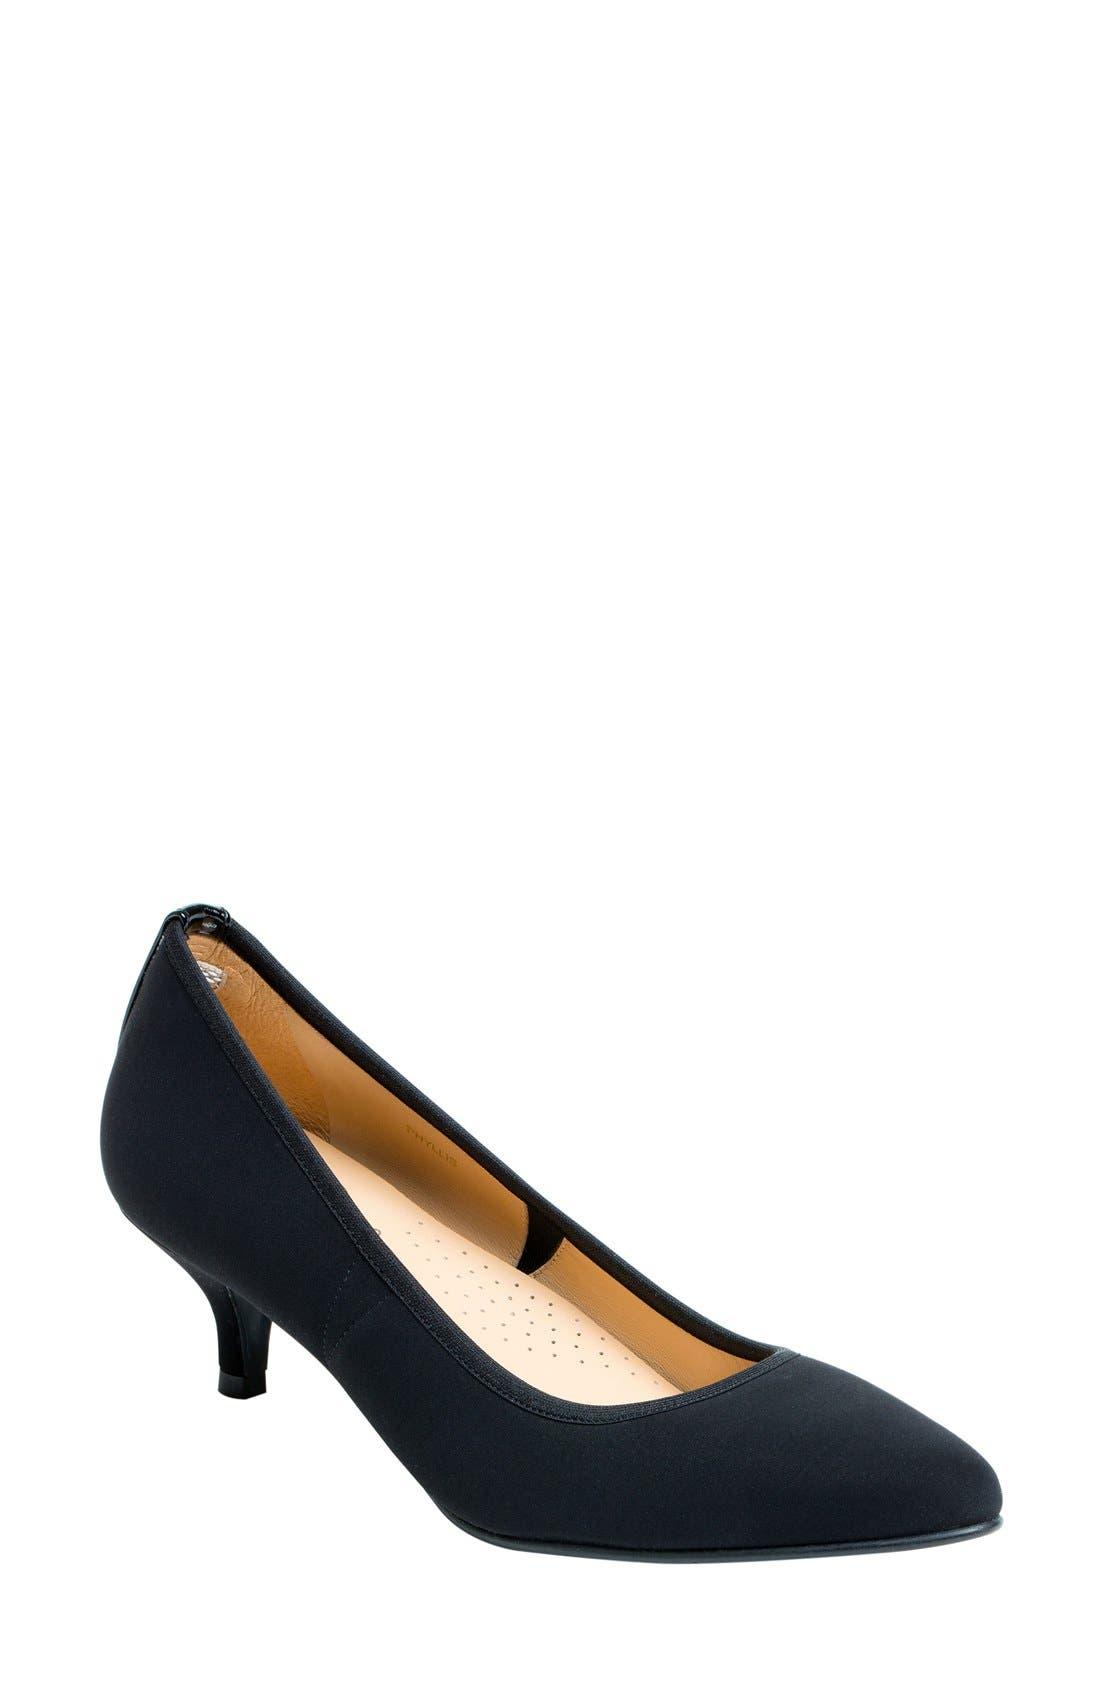 Phyllis Kitten Heel Pump,                             Main thumbnail 1, color,                             Black Fabric